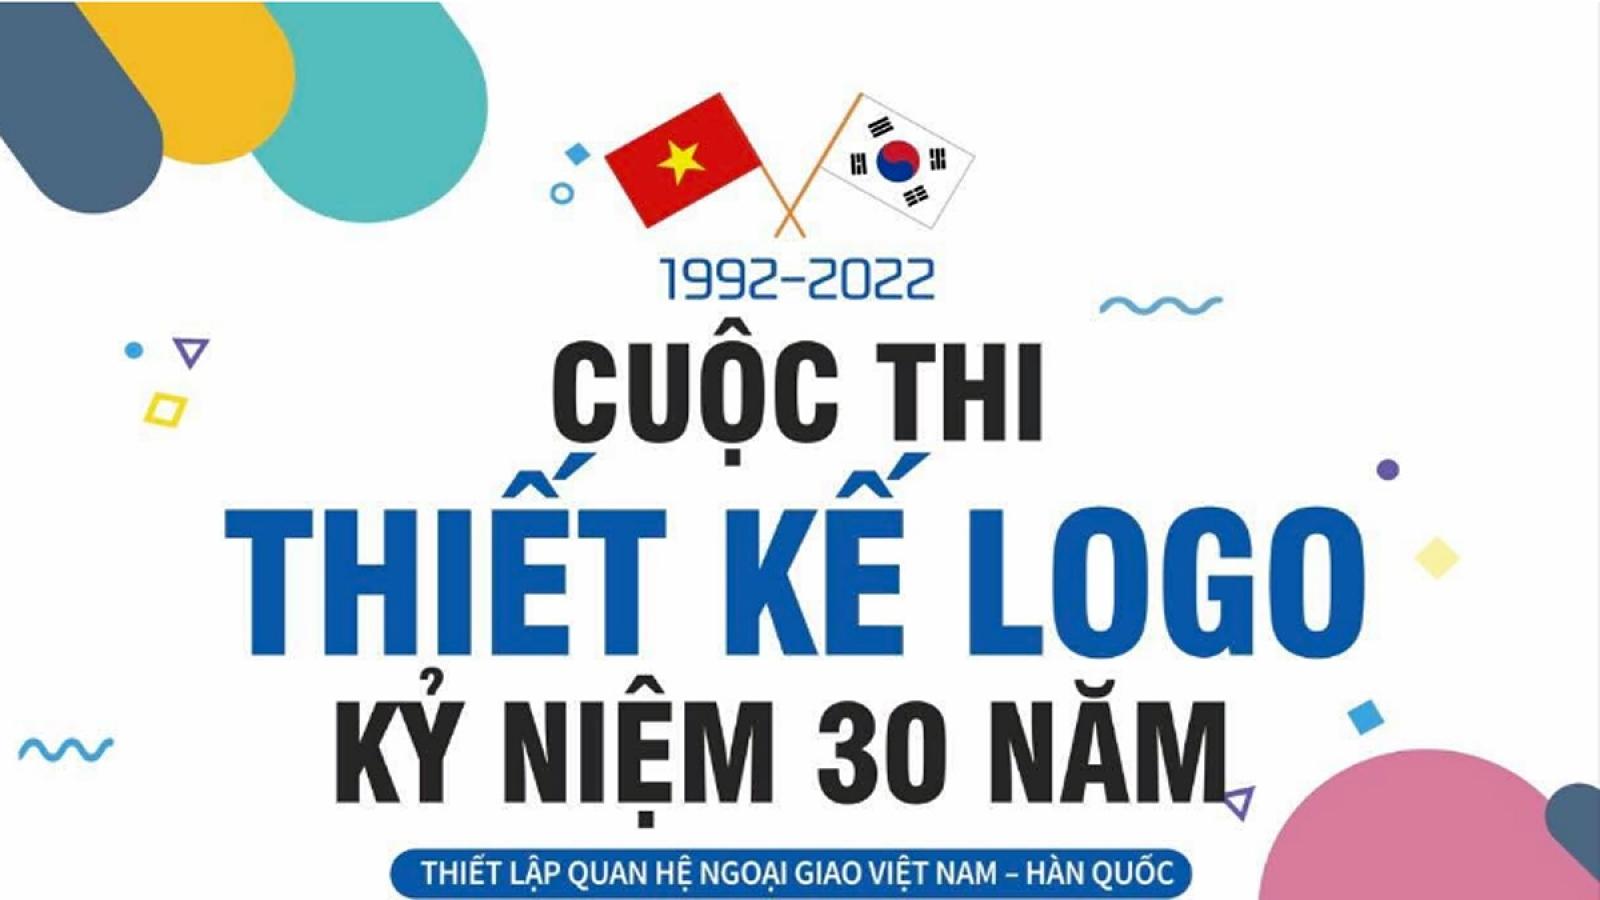 Logo design contest marks 30 years of Vietnam – RoK diplomacy